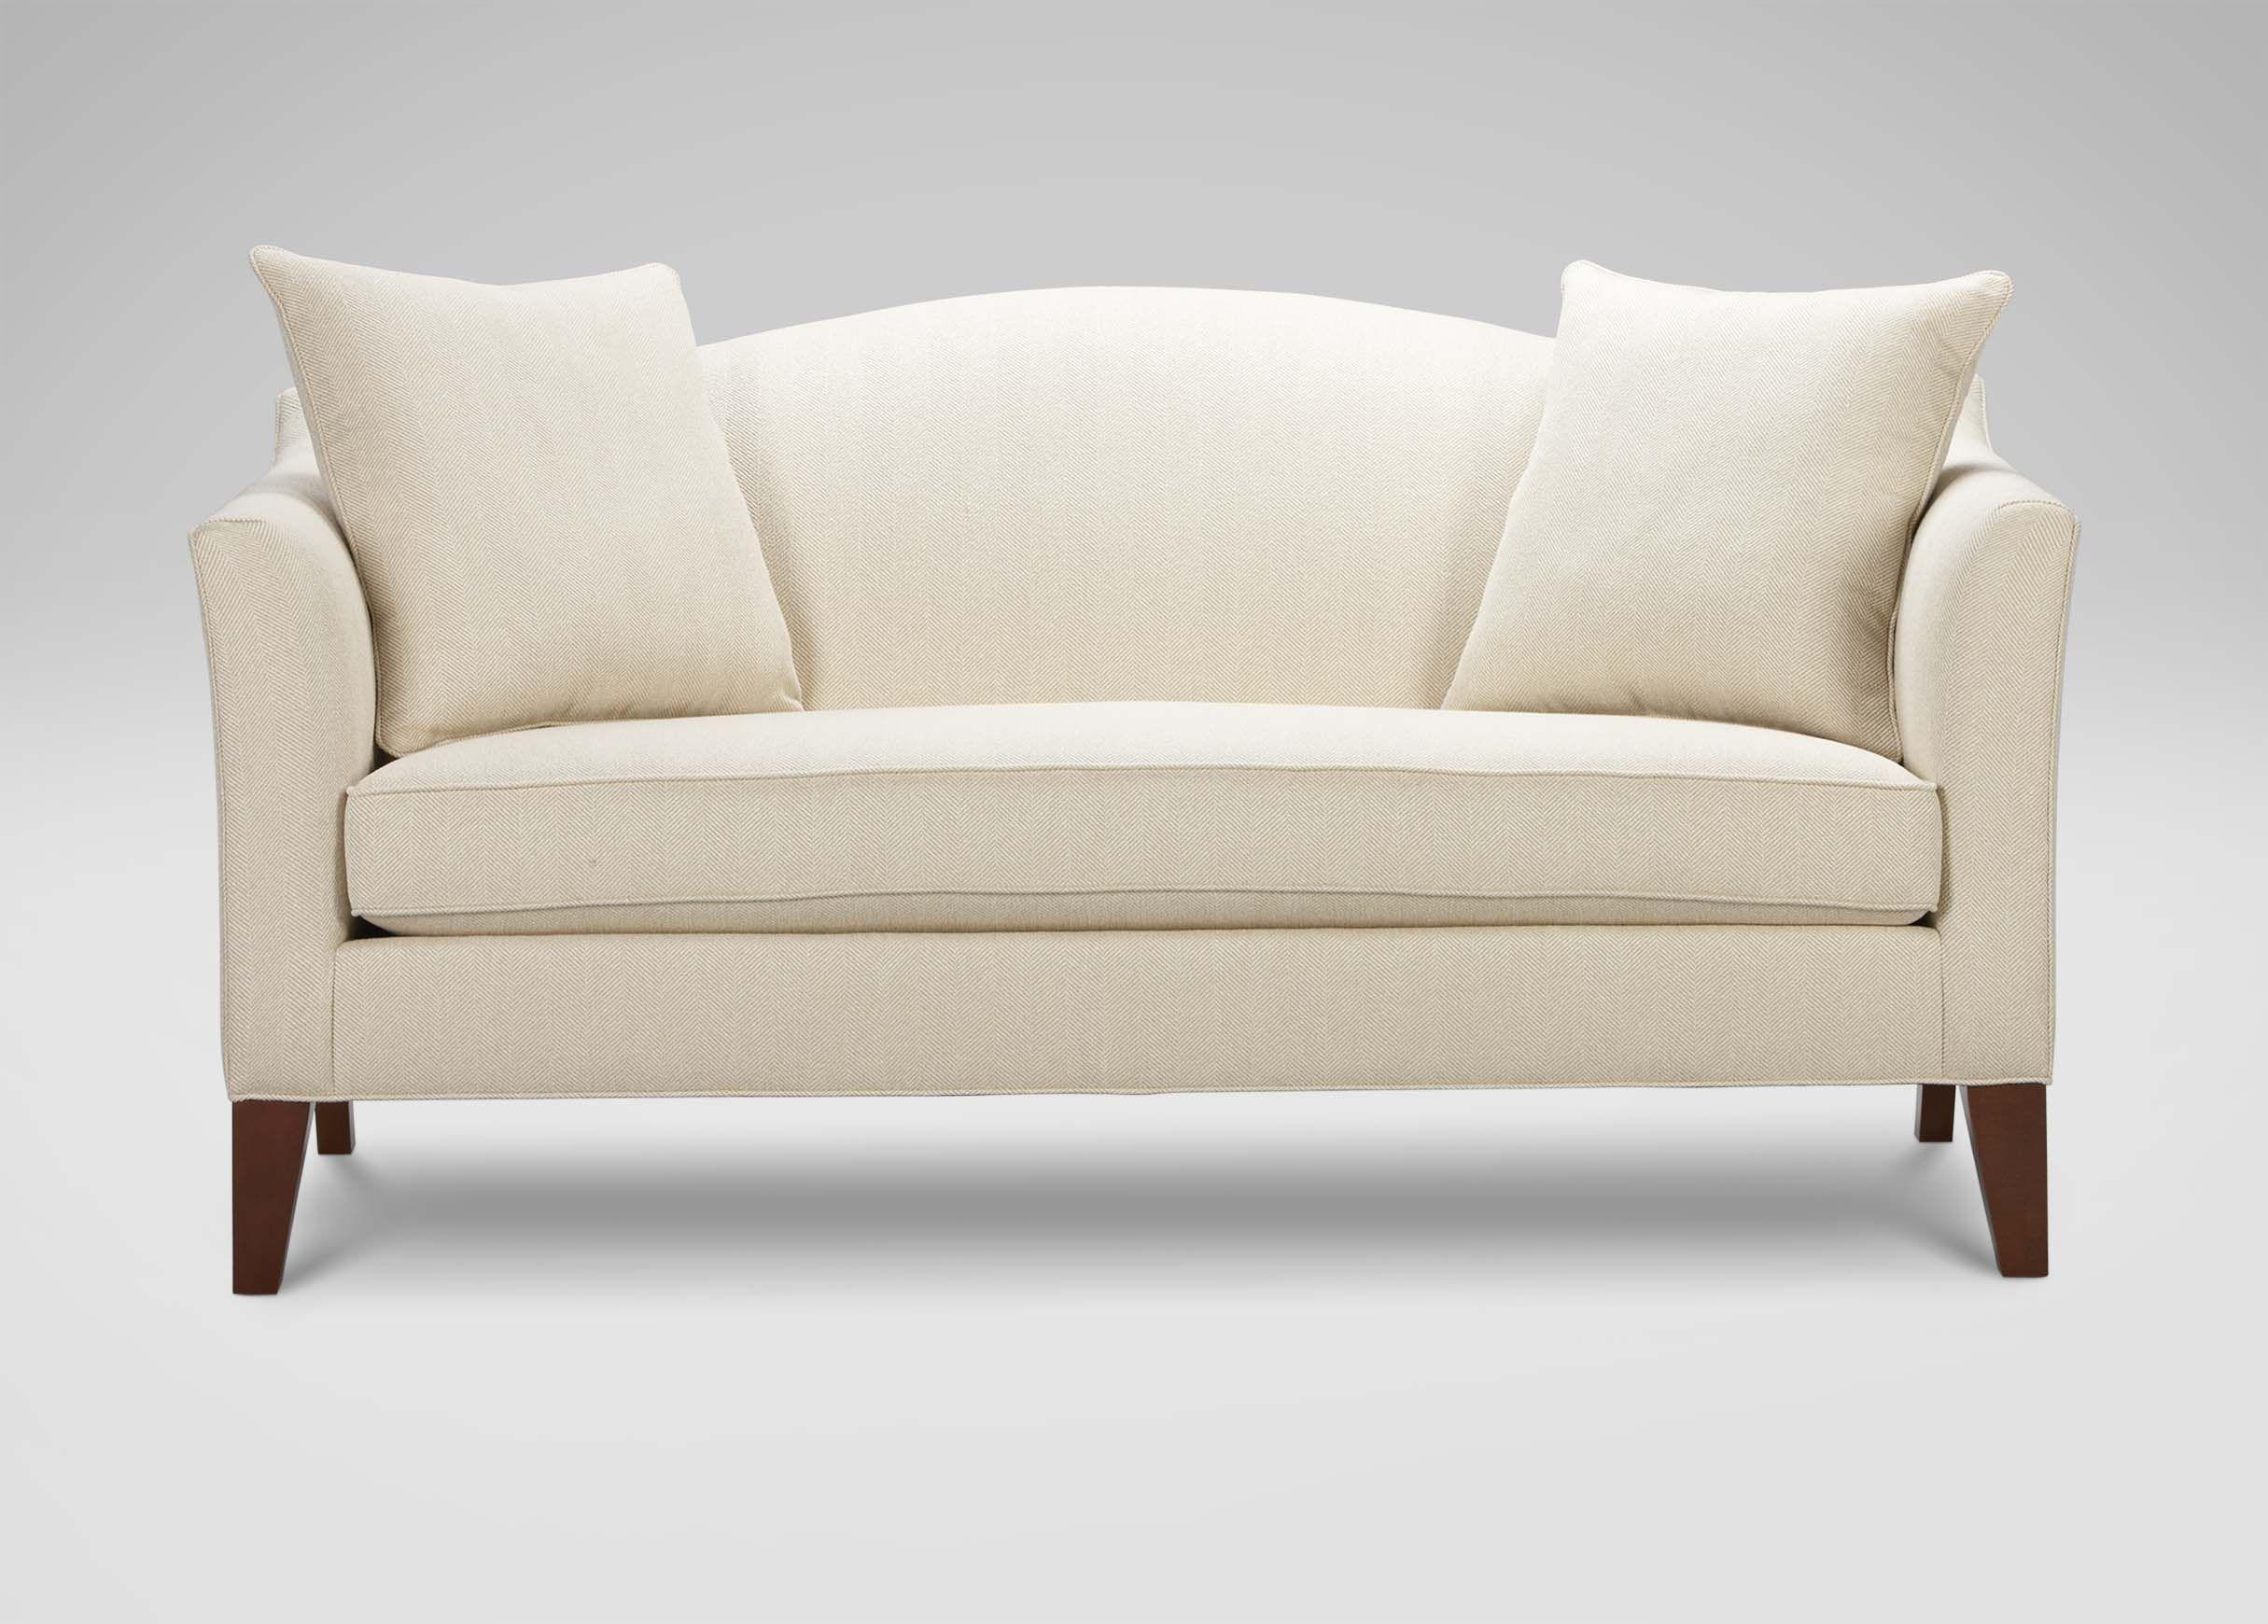 60 Inch Sofa Love Seat Cushions On Sofa Sofa